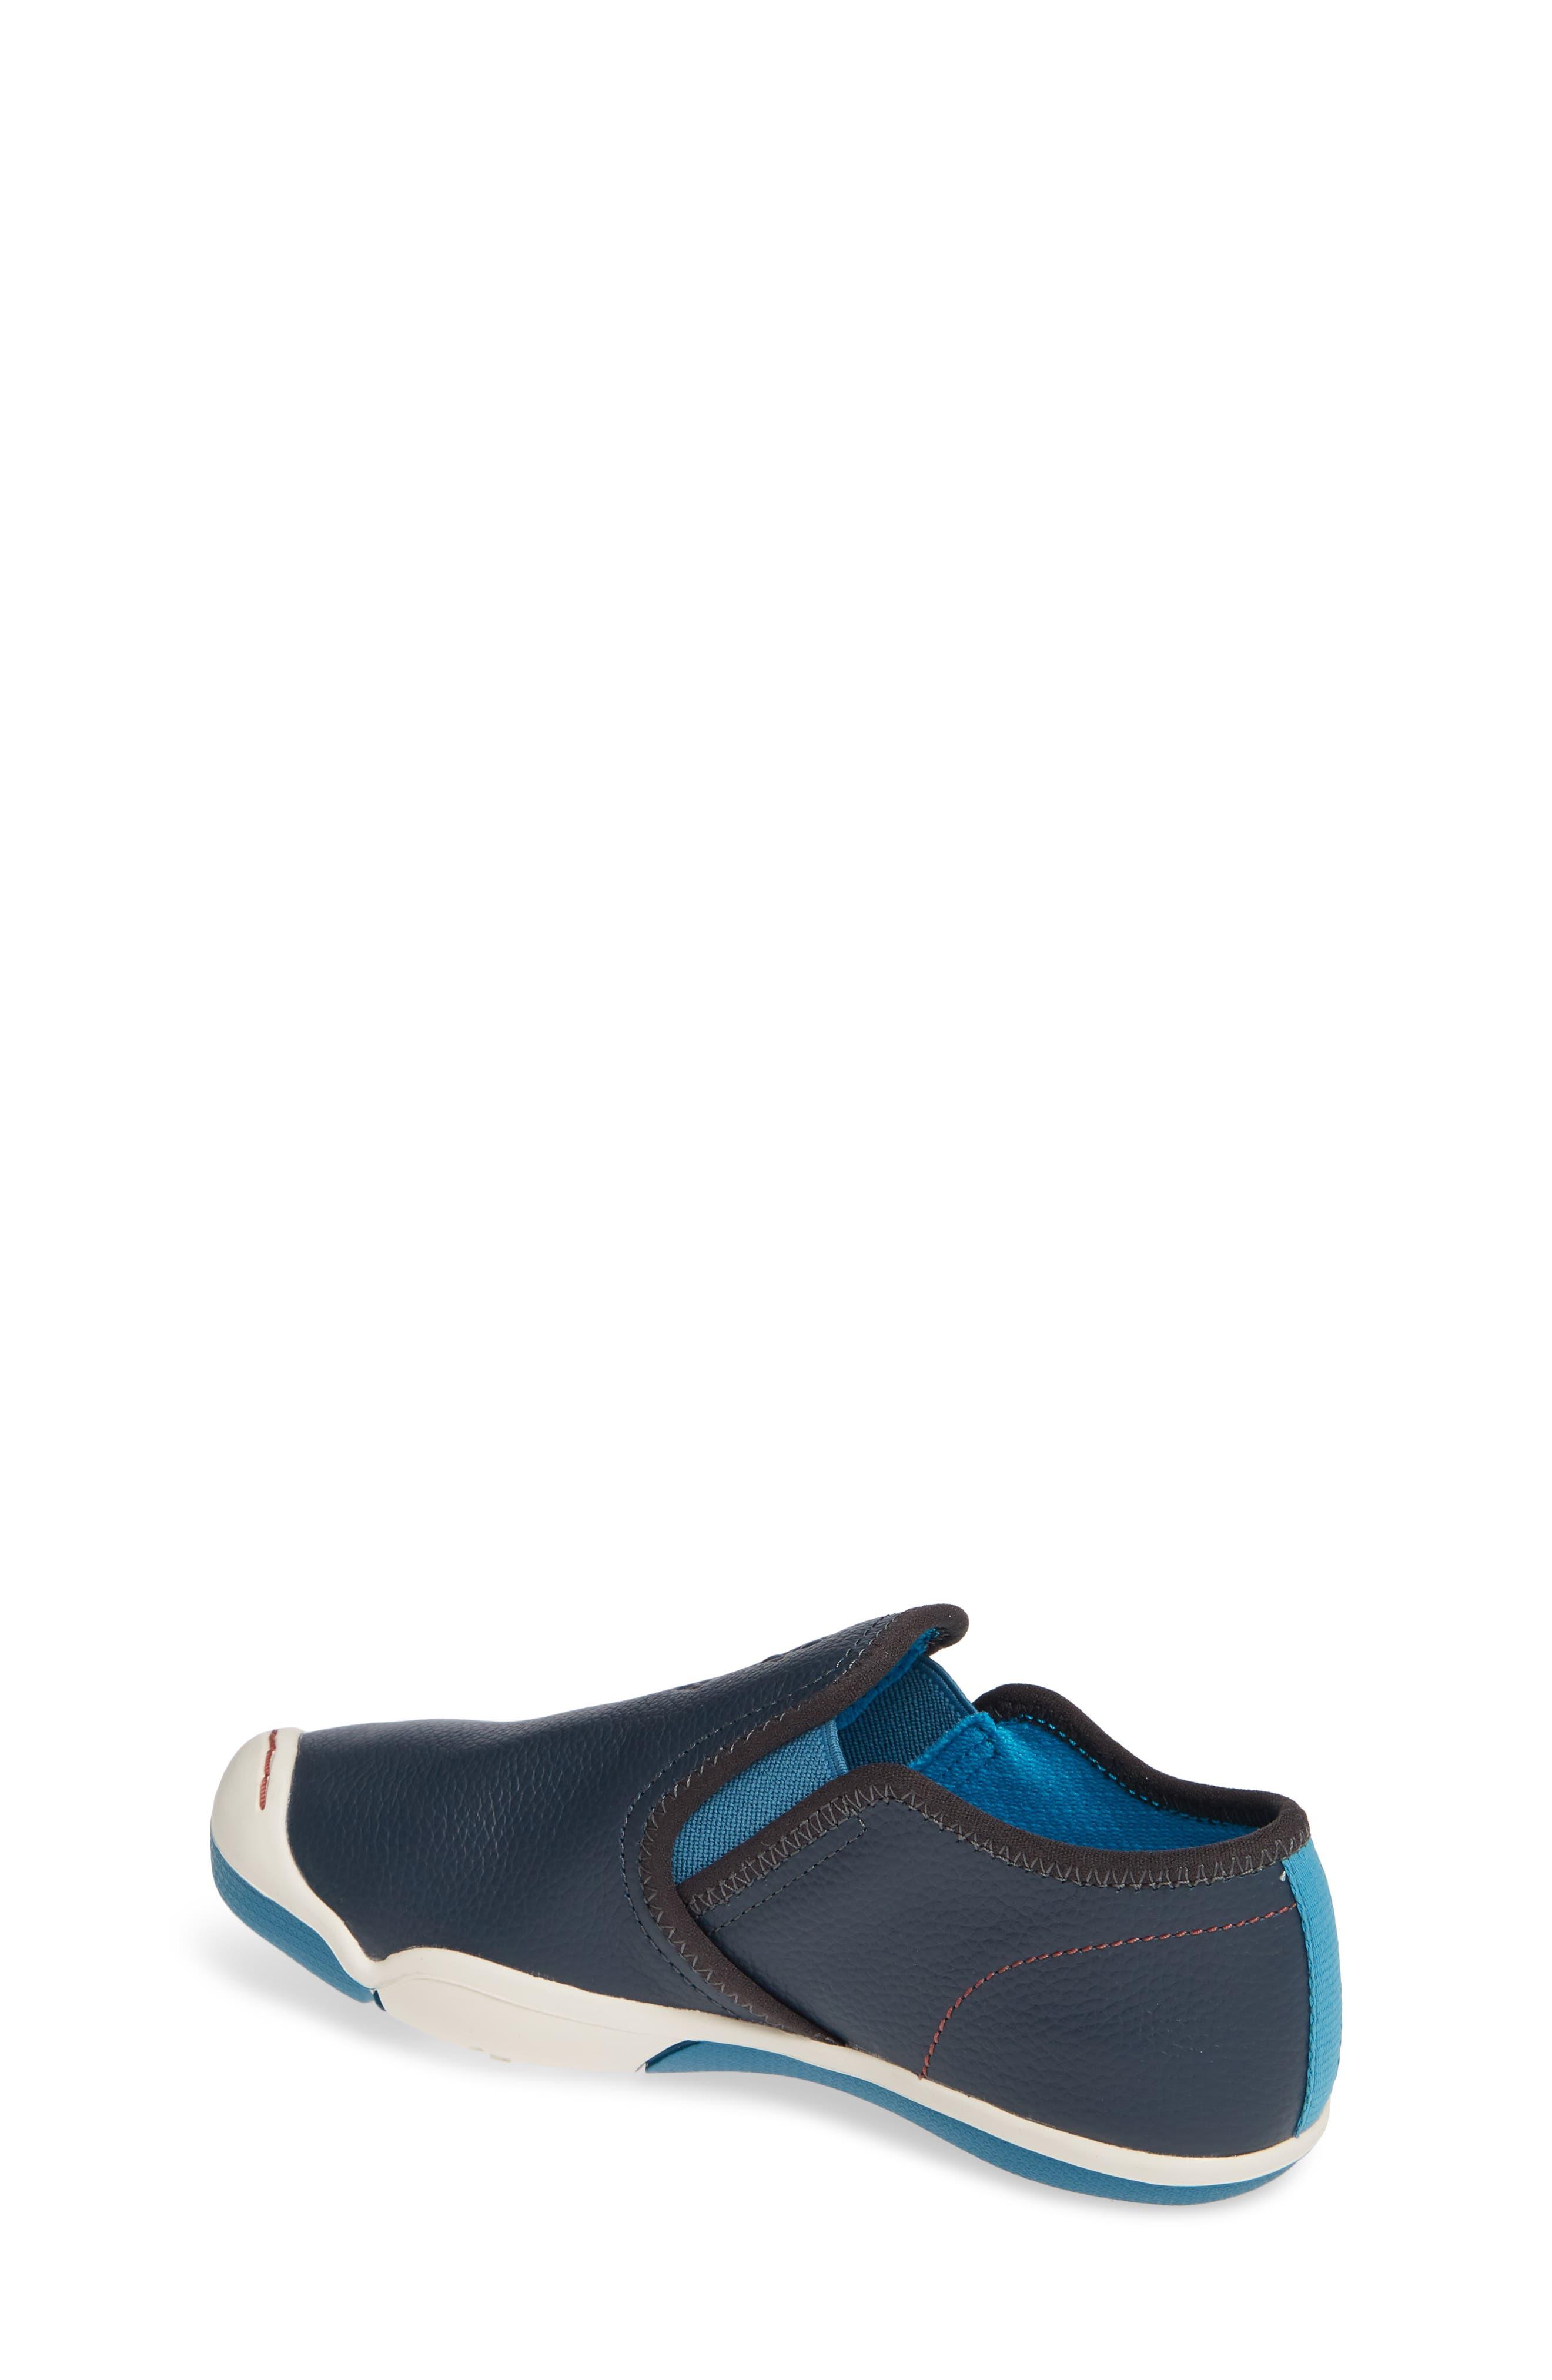 Migi Slip-On Sneaker,                             Alternate thumbnail 2, color,                             Octo Ink